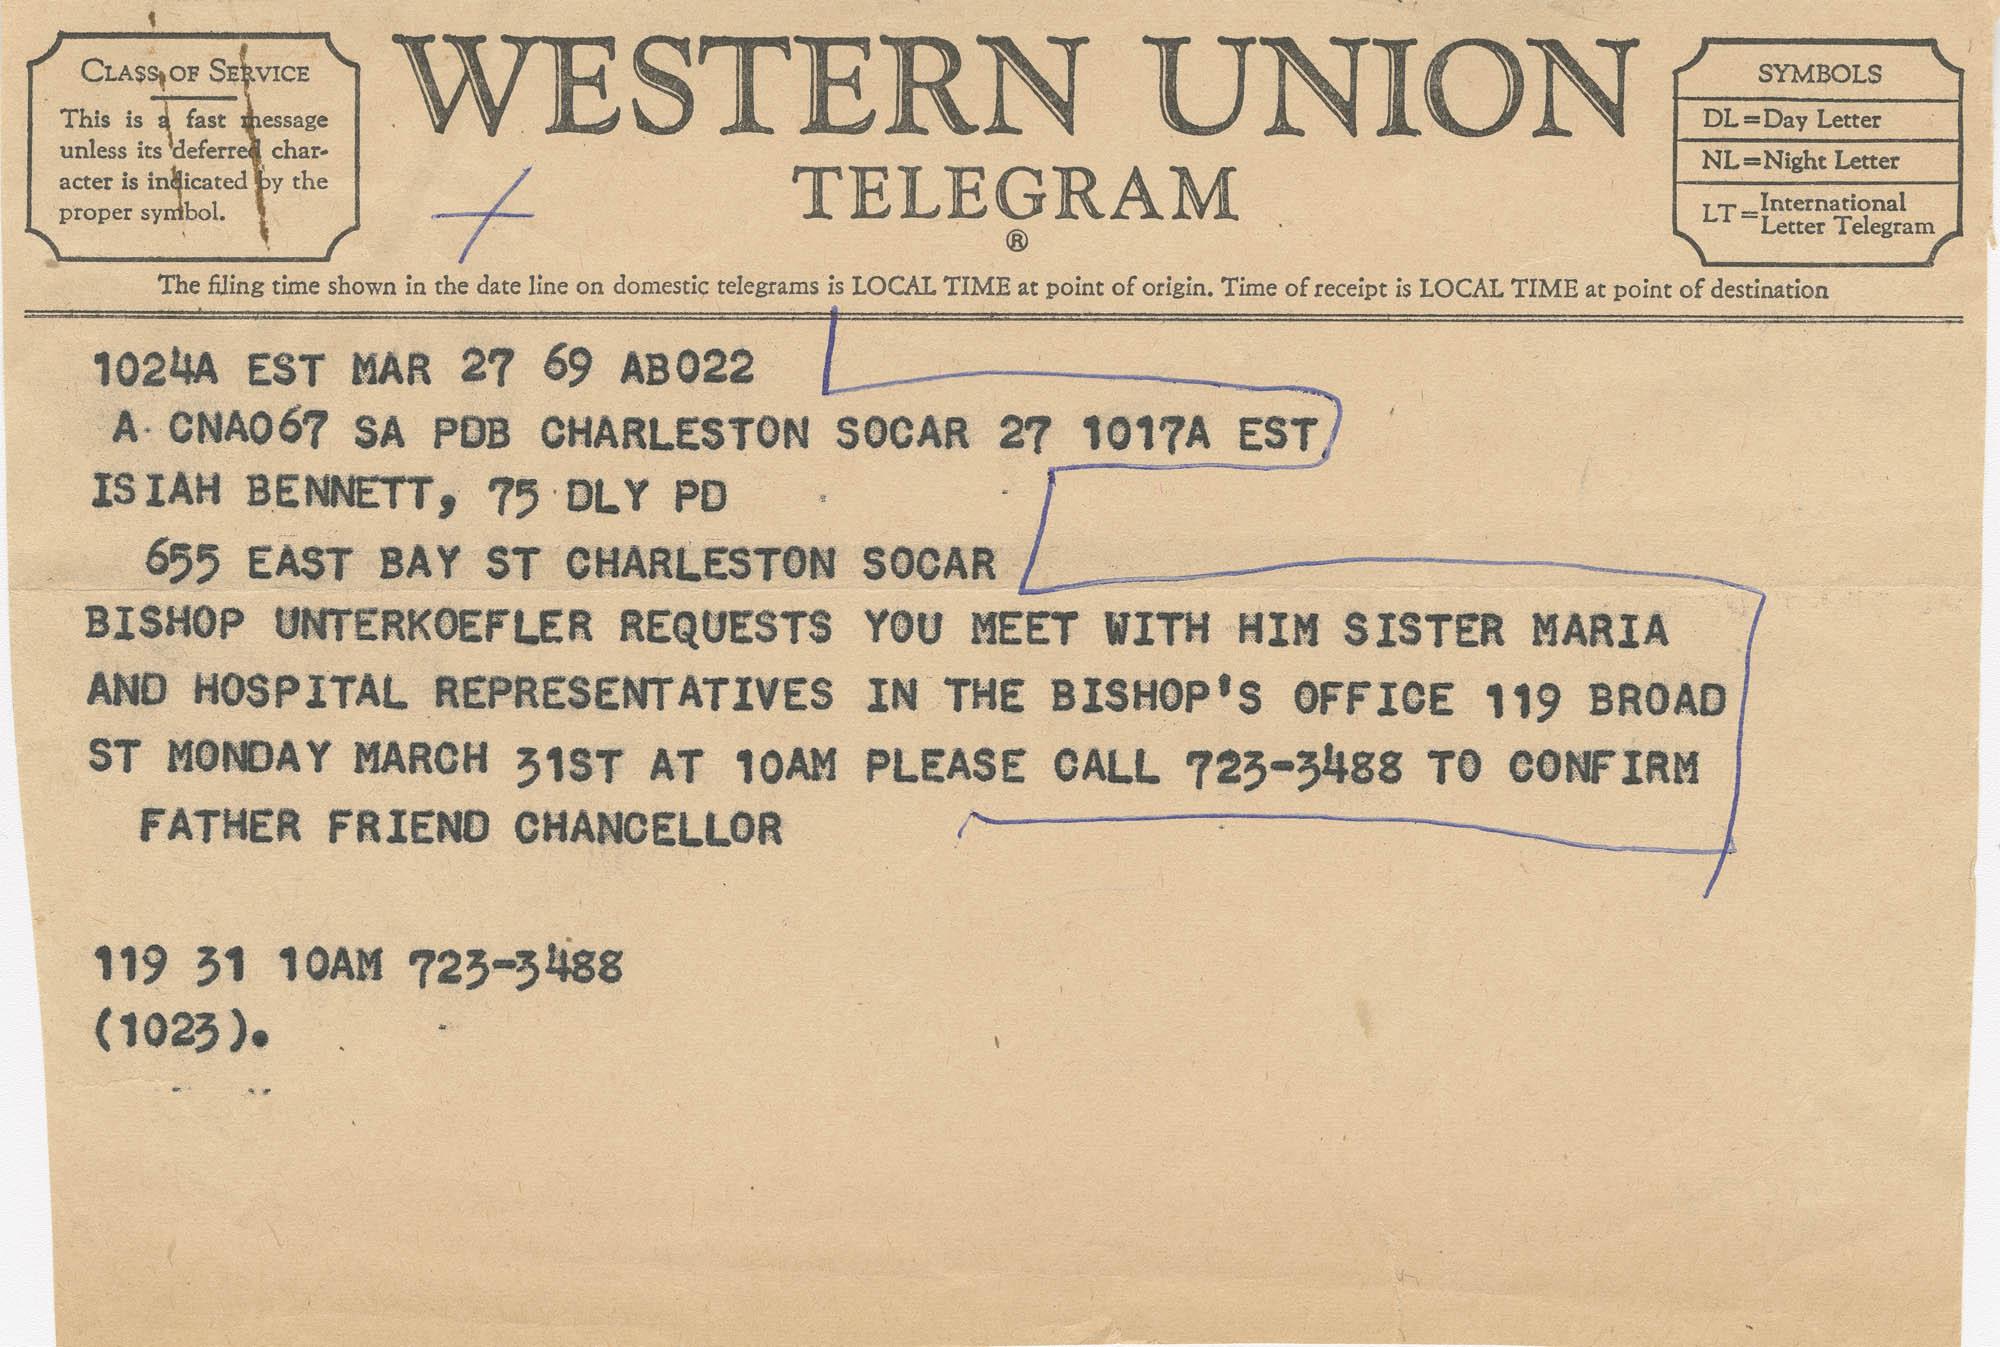 Telegram requesting a meeting with Bishop Unterkoefler